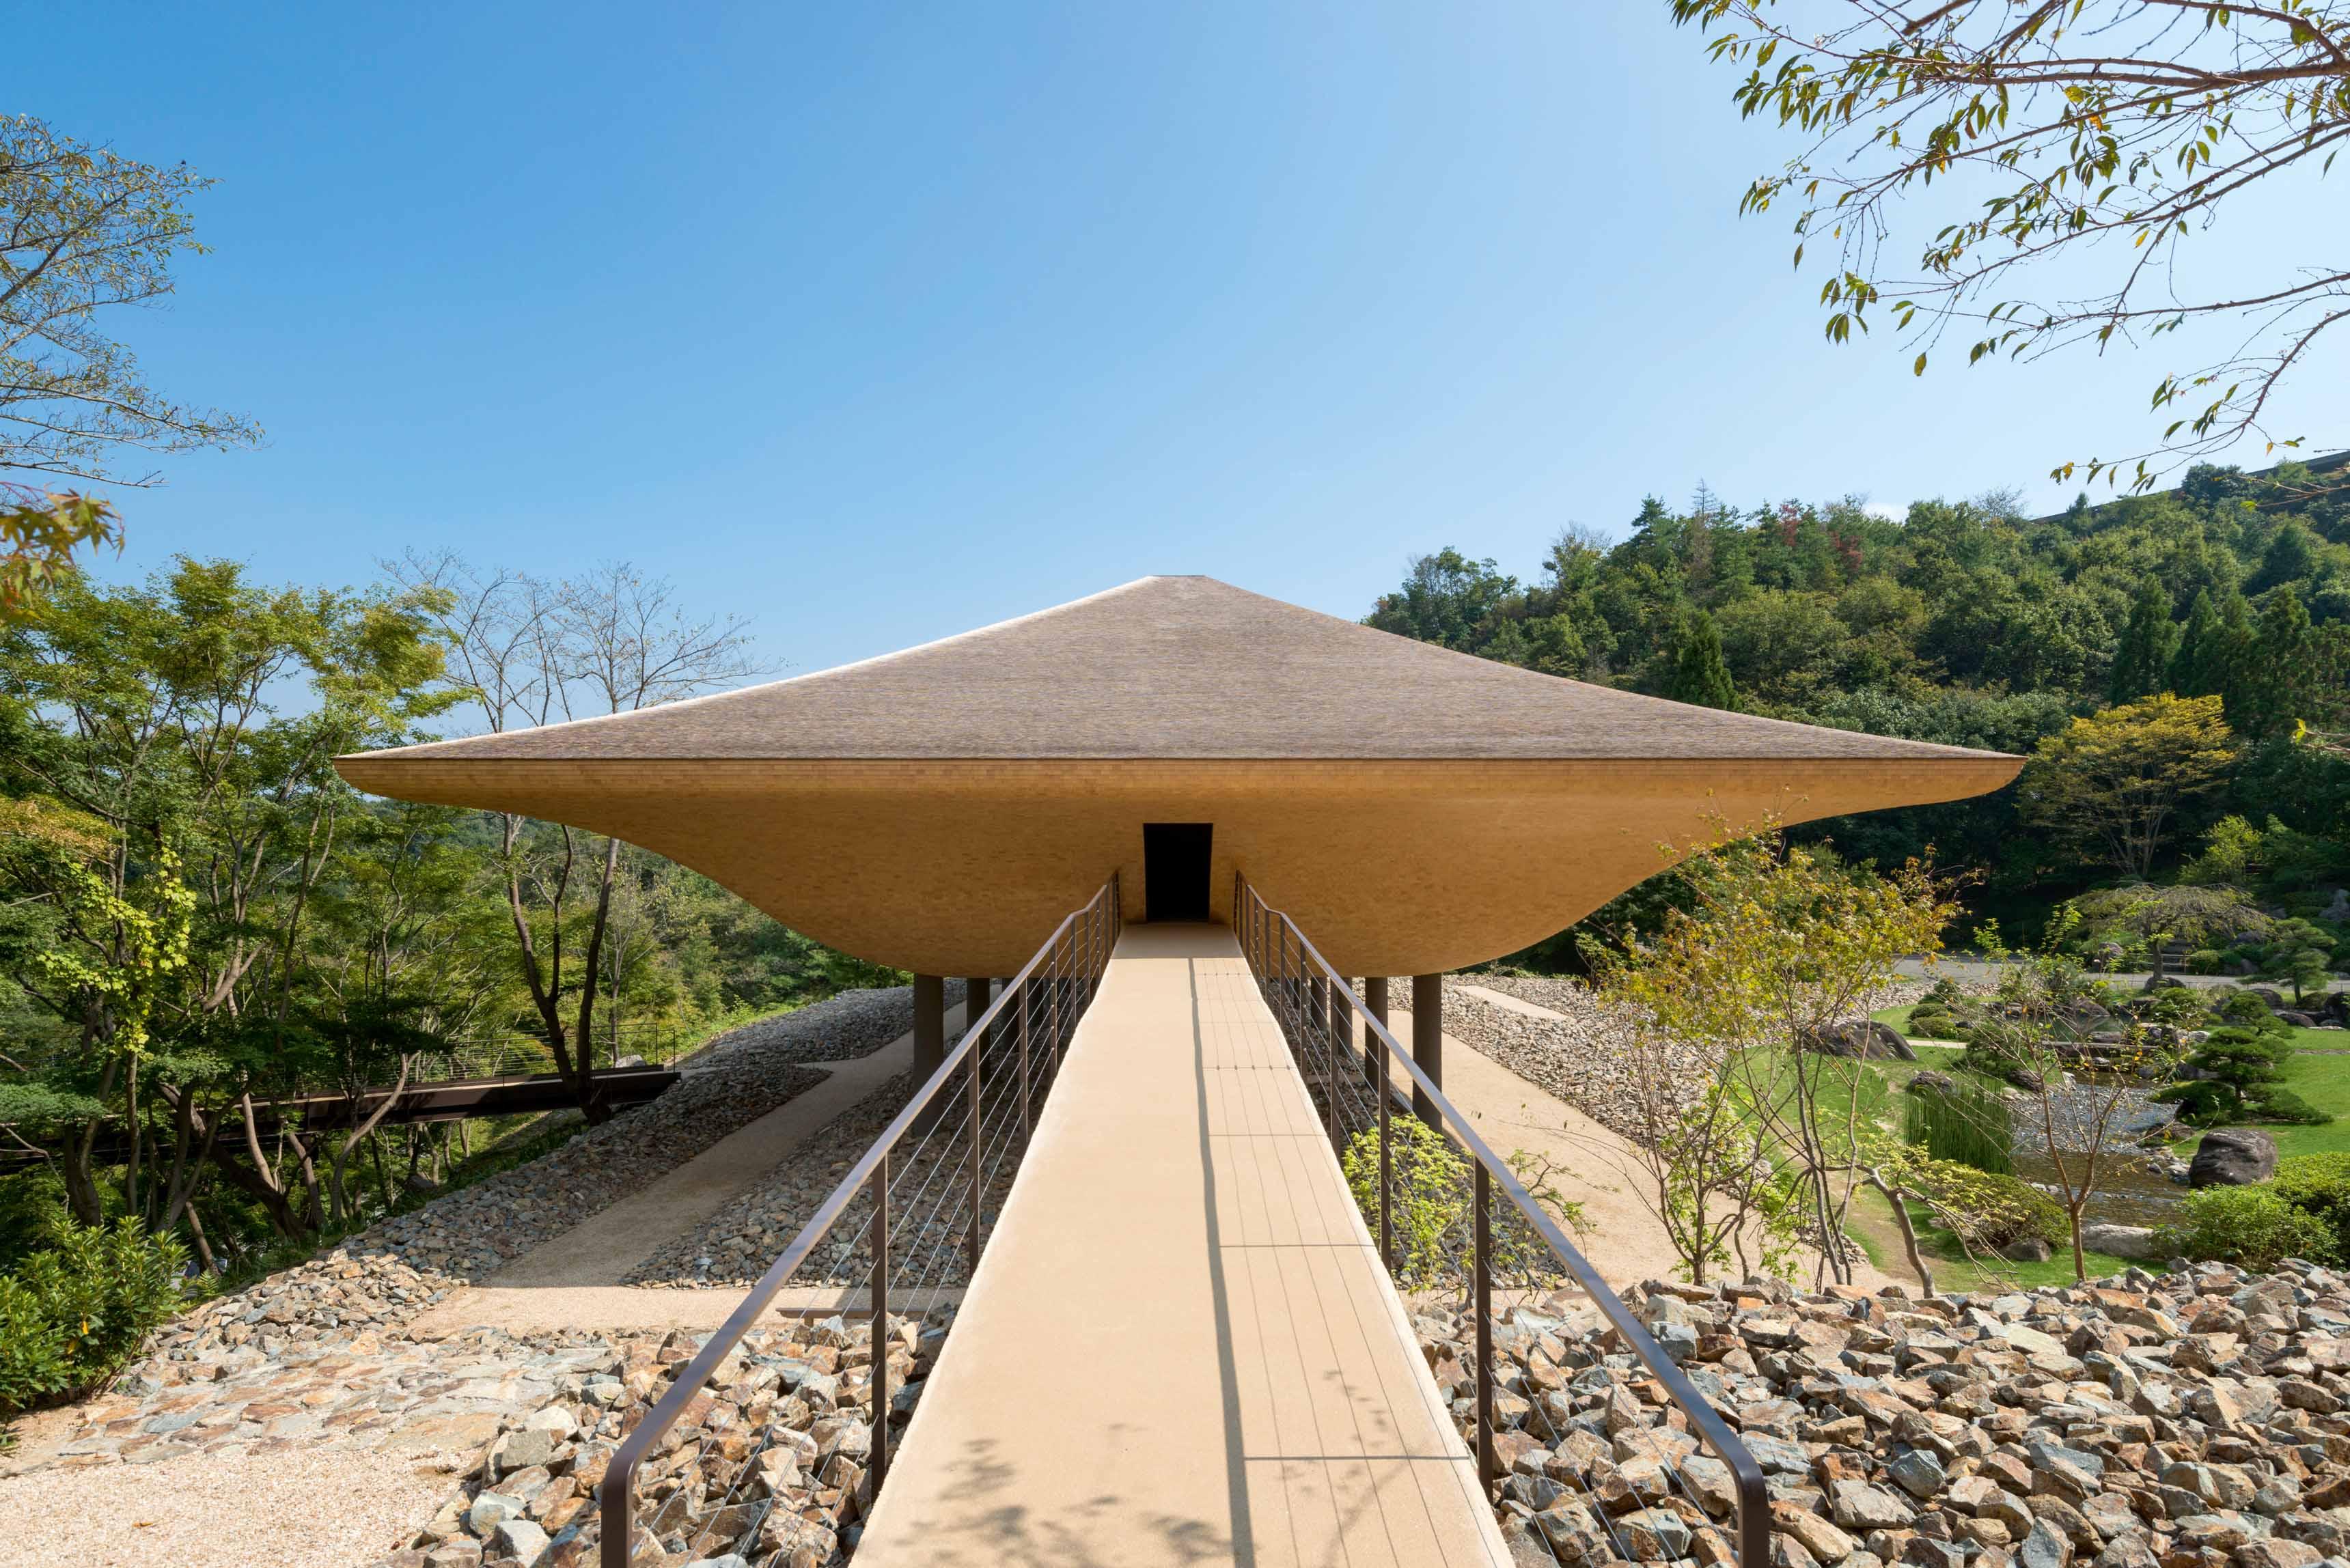 Le pavillon Kohtei (2016) de Yoshitaka Lee, Yuichi Kodai et Kohei Nawa (studio Sandwich, Kyoto) à Fukuyama, Japon.